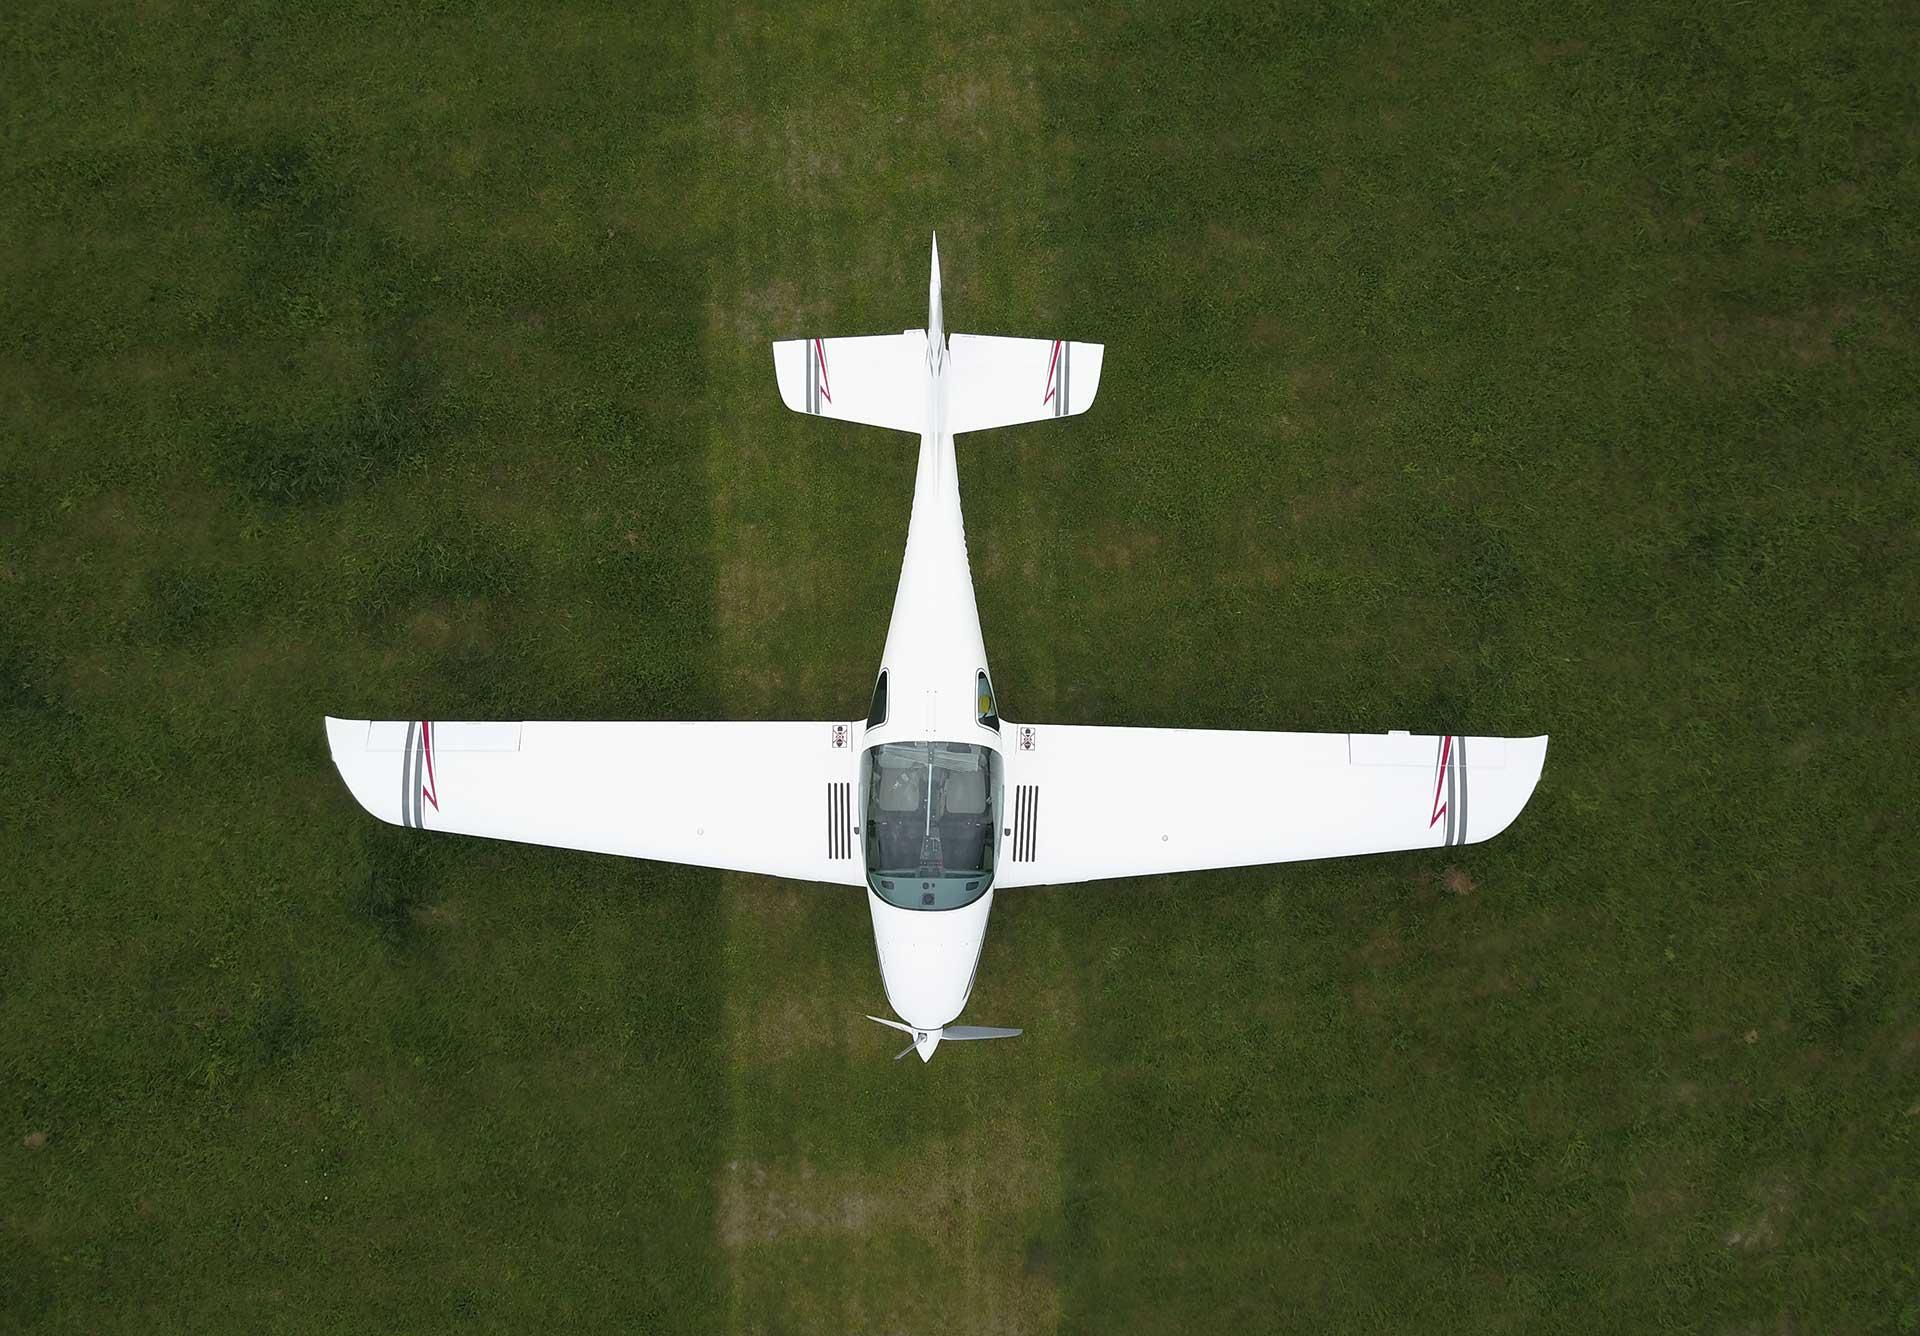 Vente d'avion ATEC 321 FAETA NG par ATA by Pelletier